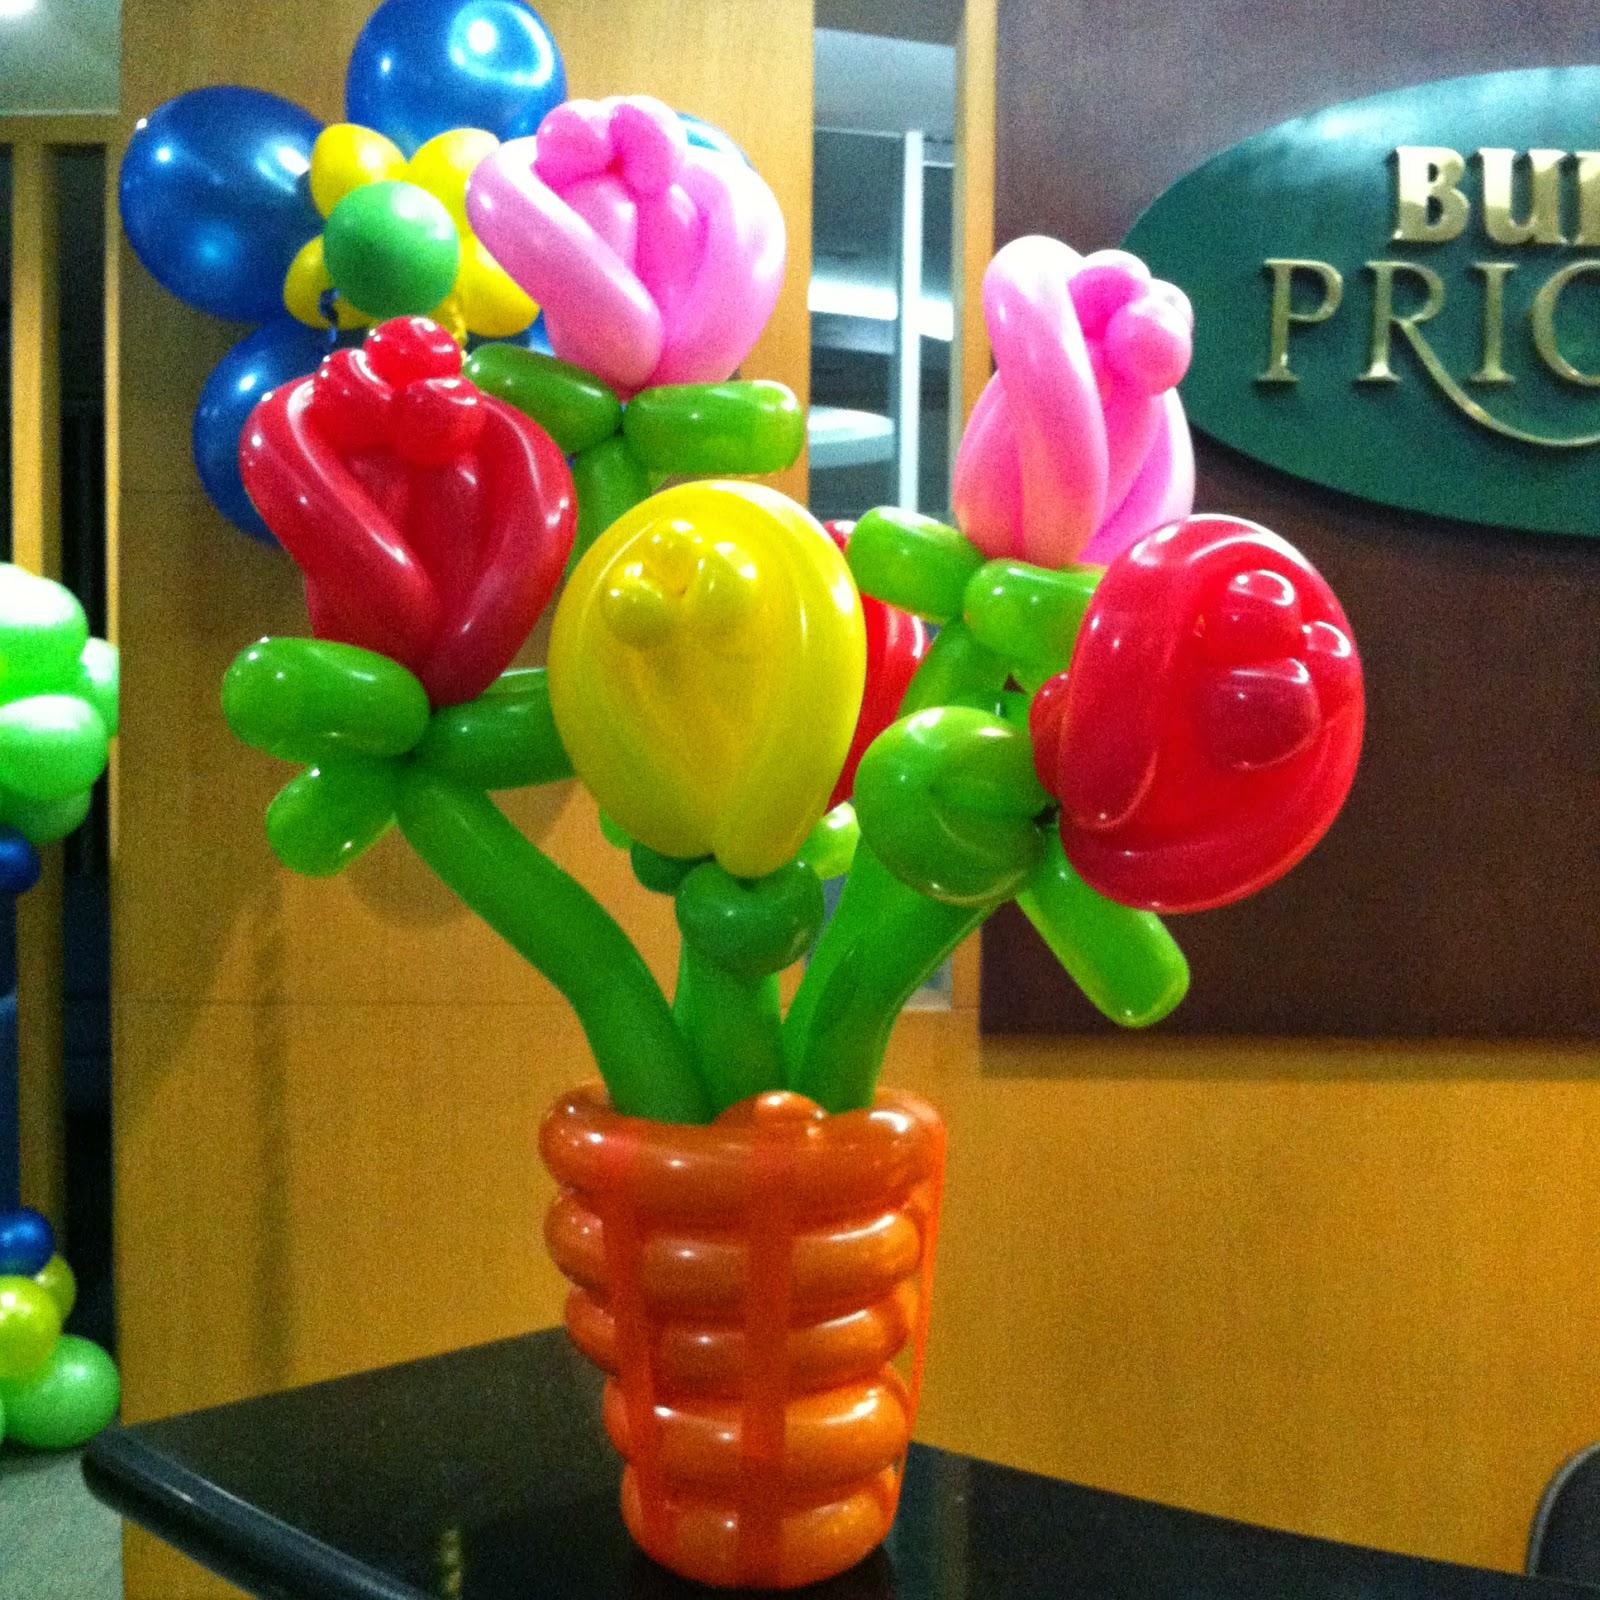 dekorasi balon bank Bukopin